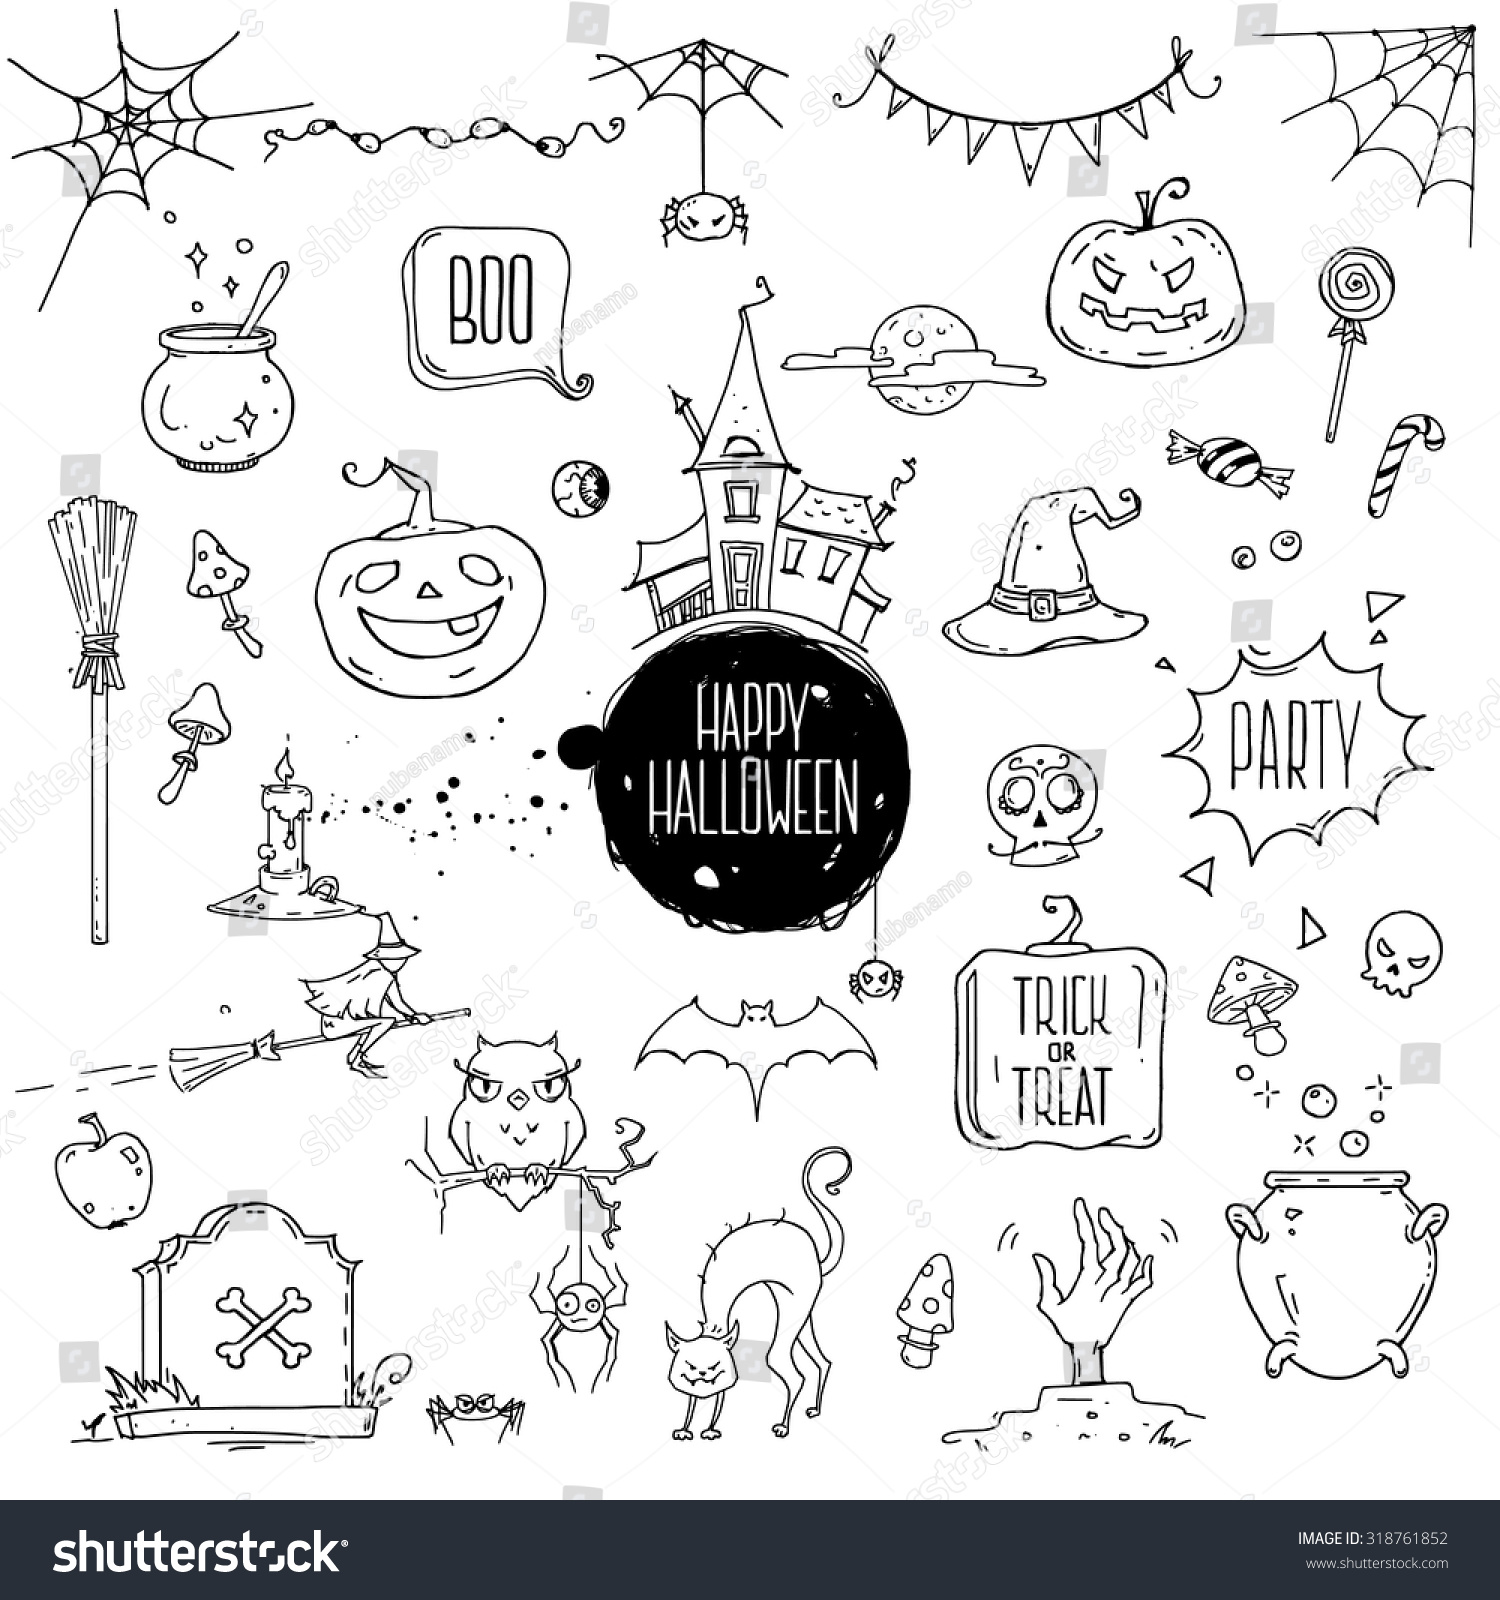 Halloween symbols hand drawn traditional illustrations